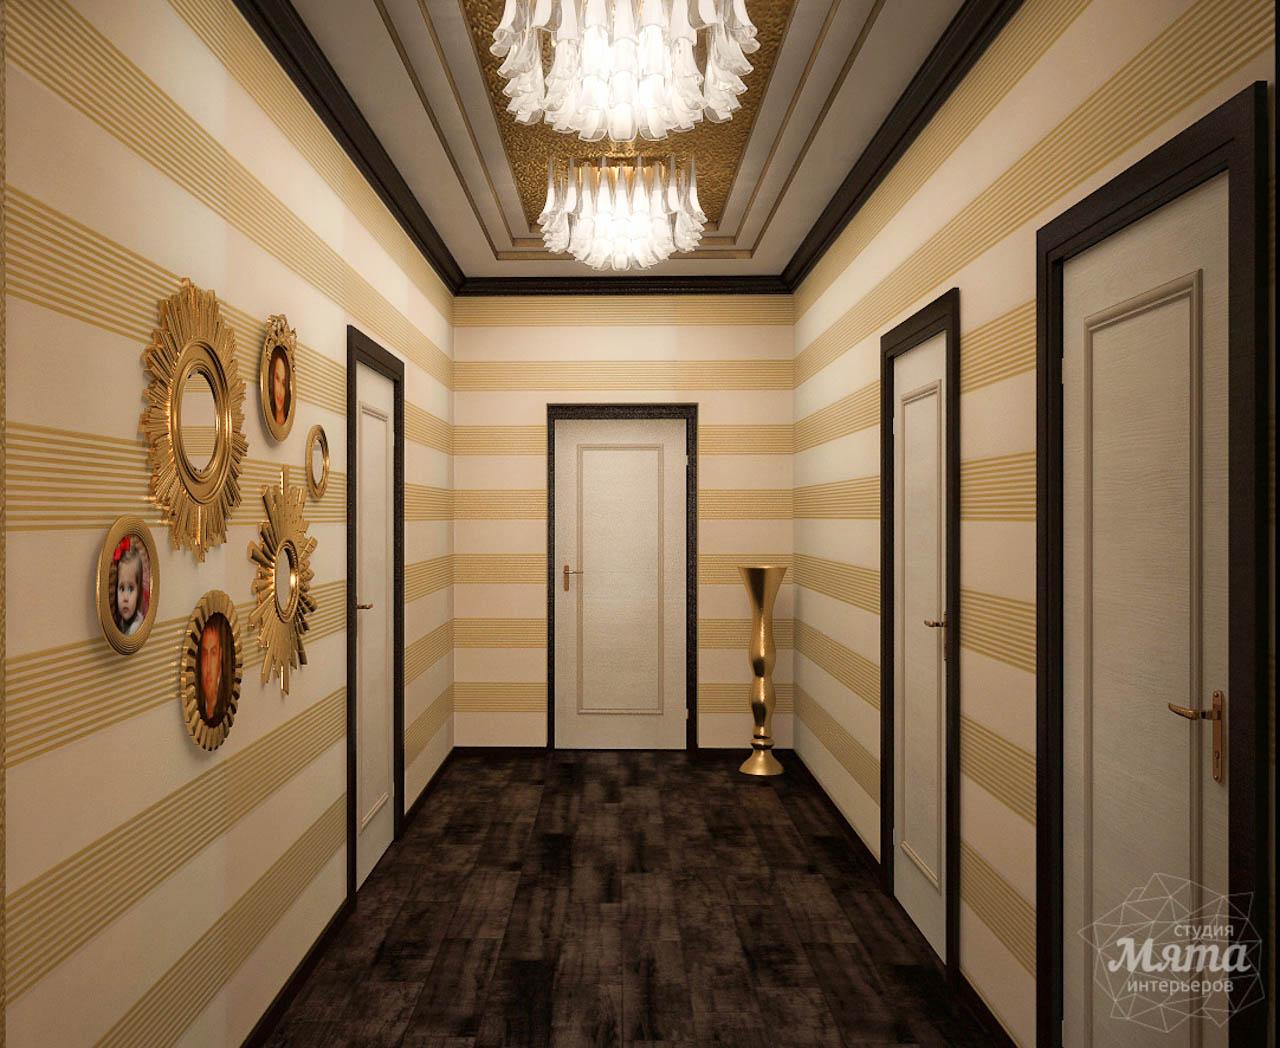 Дизайн интерьера коттеджа по ул. Ландышевая 23 img136813393